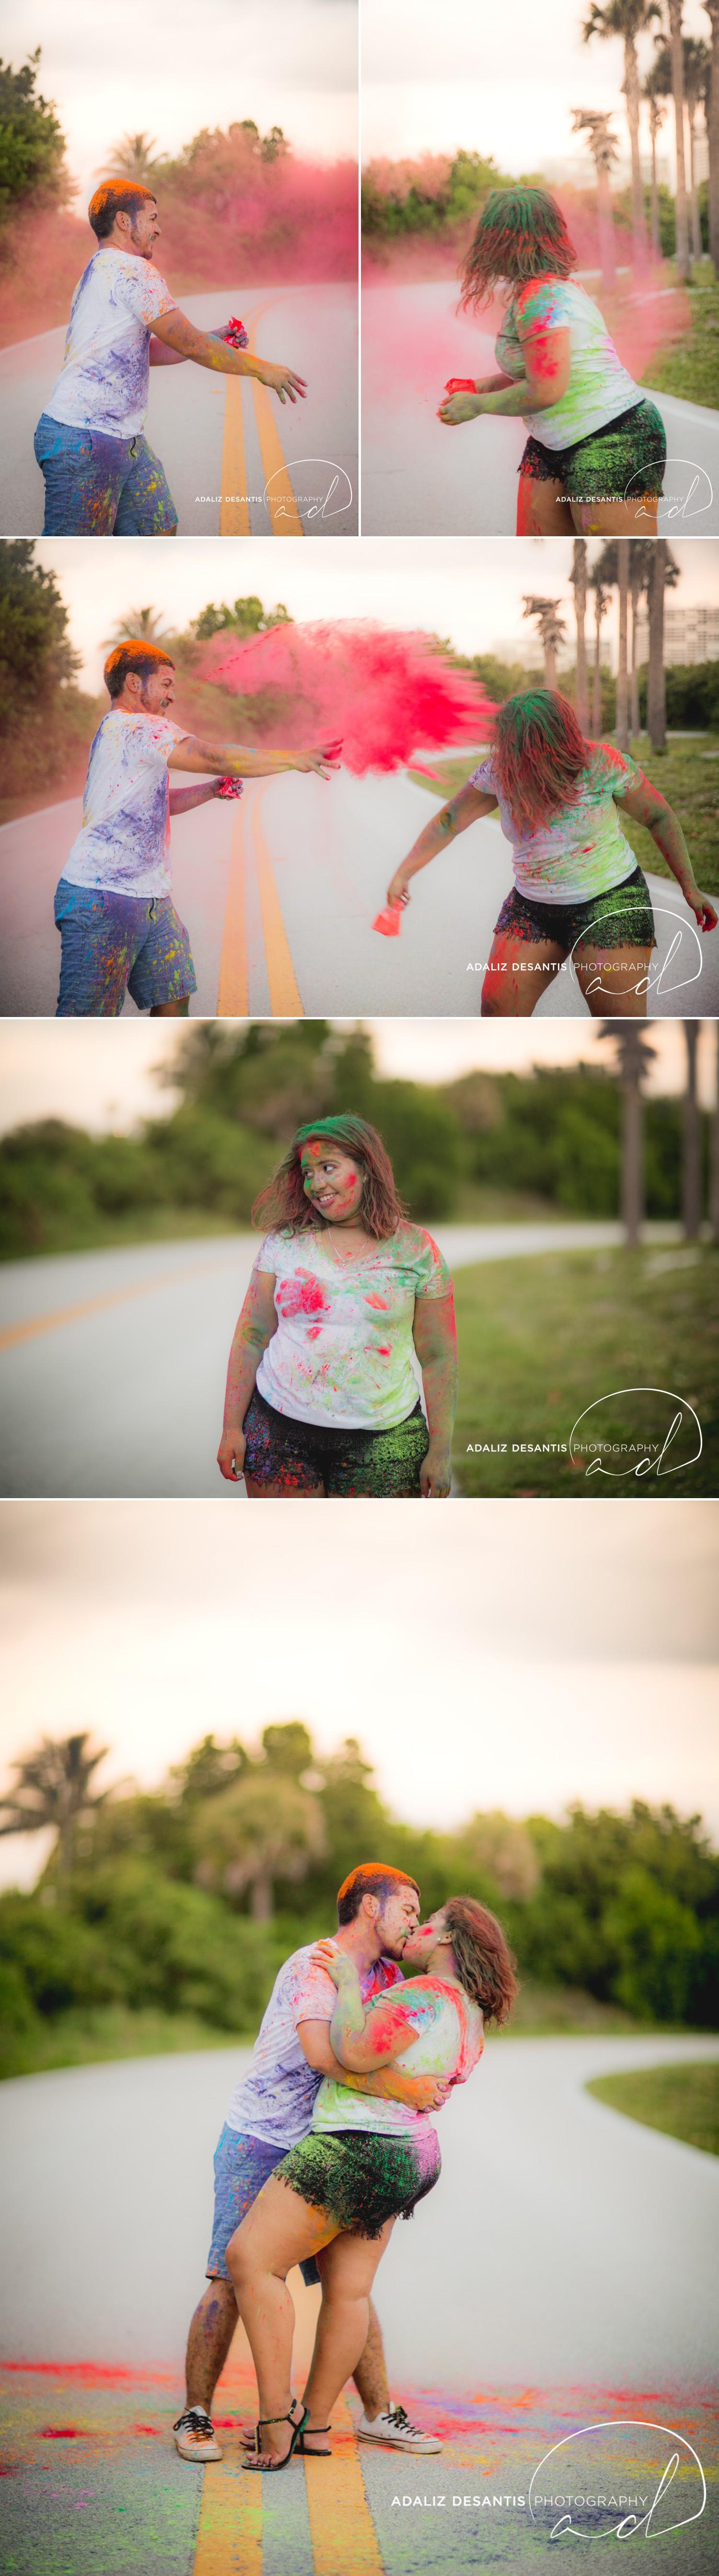 John U Lloyd Beach State Park Paint War Dania Beach Fort Lauderdale Engagement Session 27.jpg